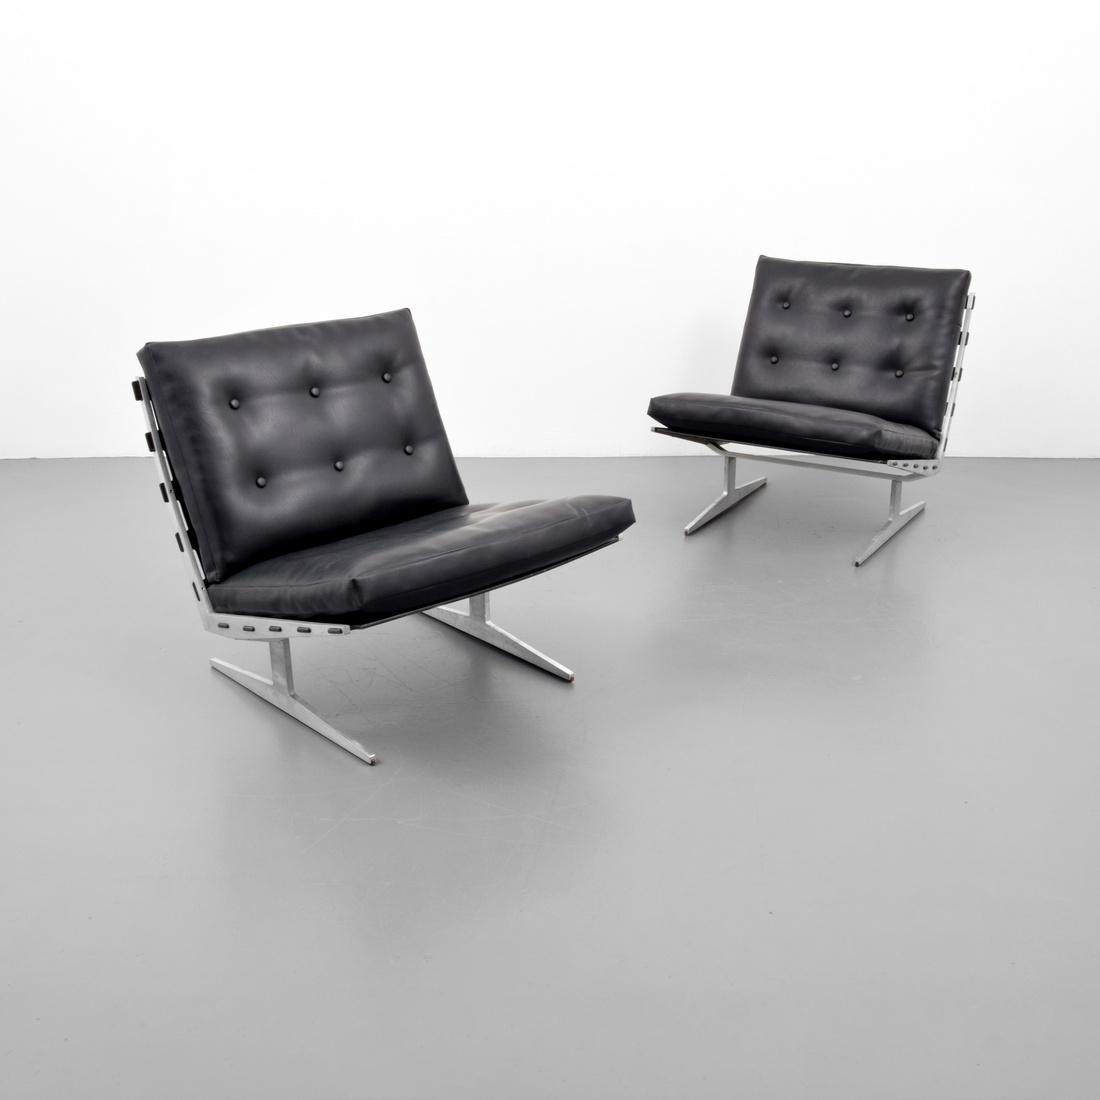 Pair Of Paul Leidersdorff CARAVELLE Lounge Chairs